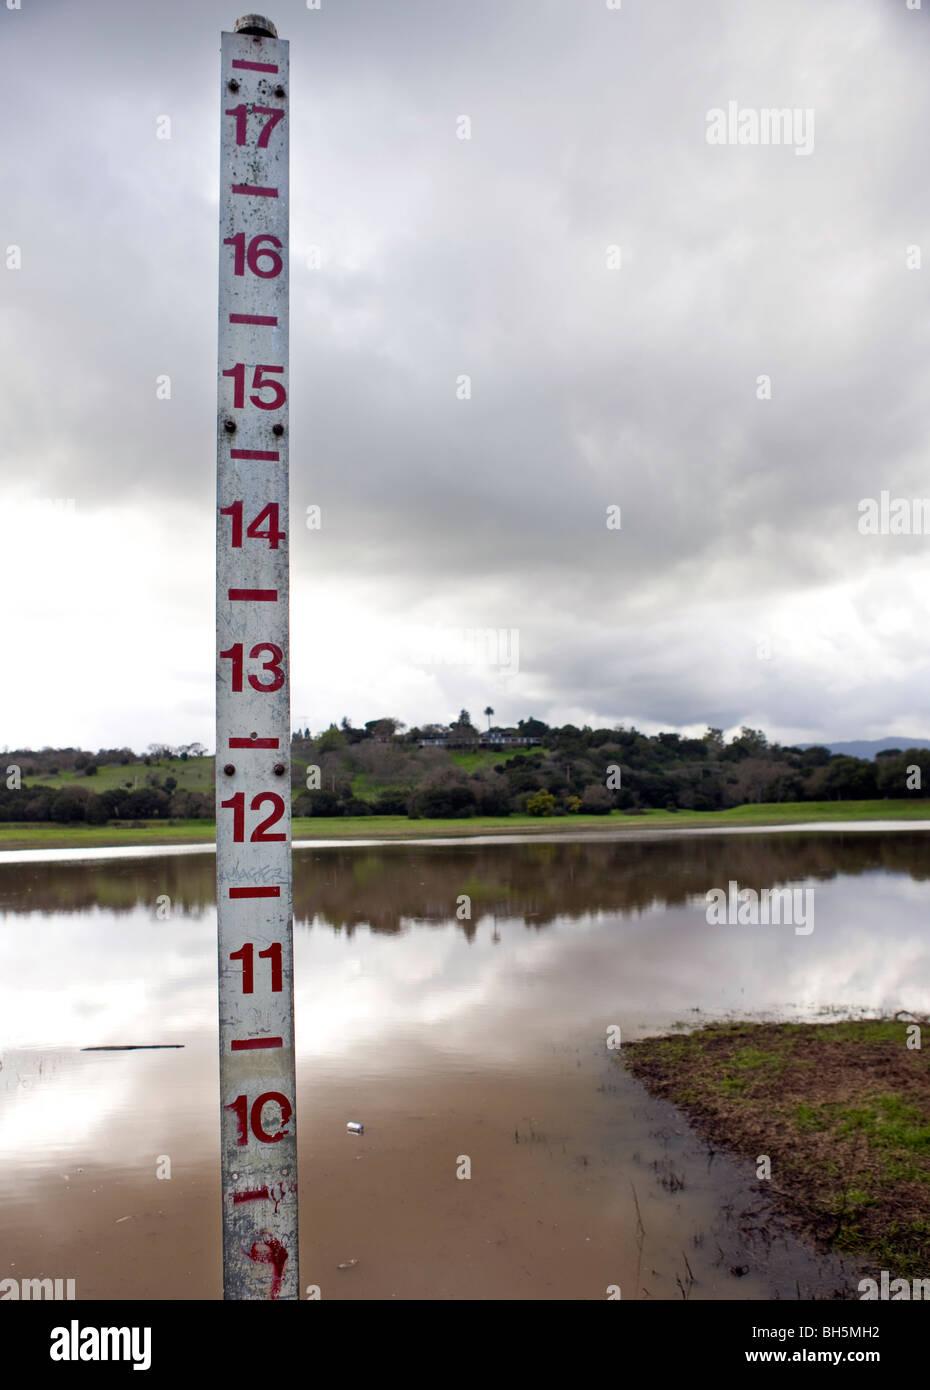 Meter measuring the depth of Lake Lagunita, filled with water, Stanford University, Stanford California, United - Stock Image